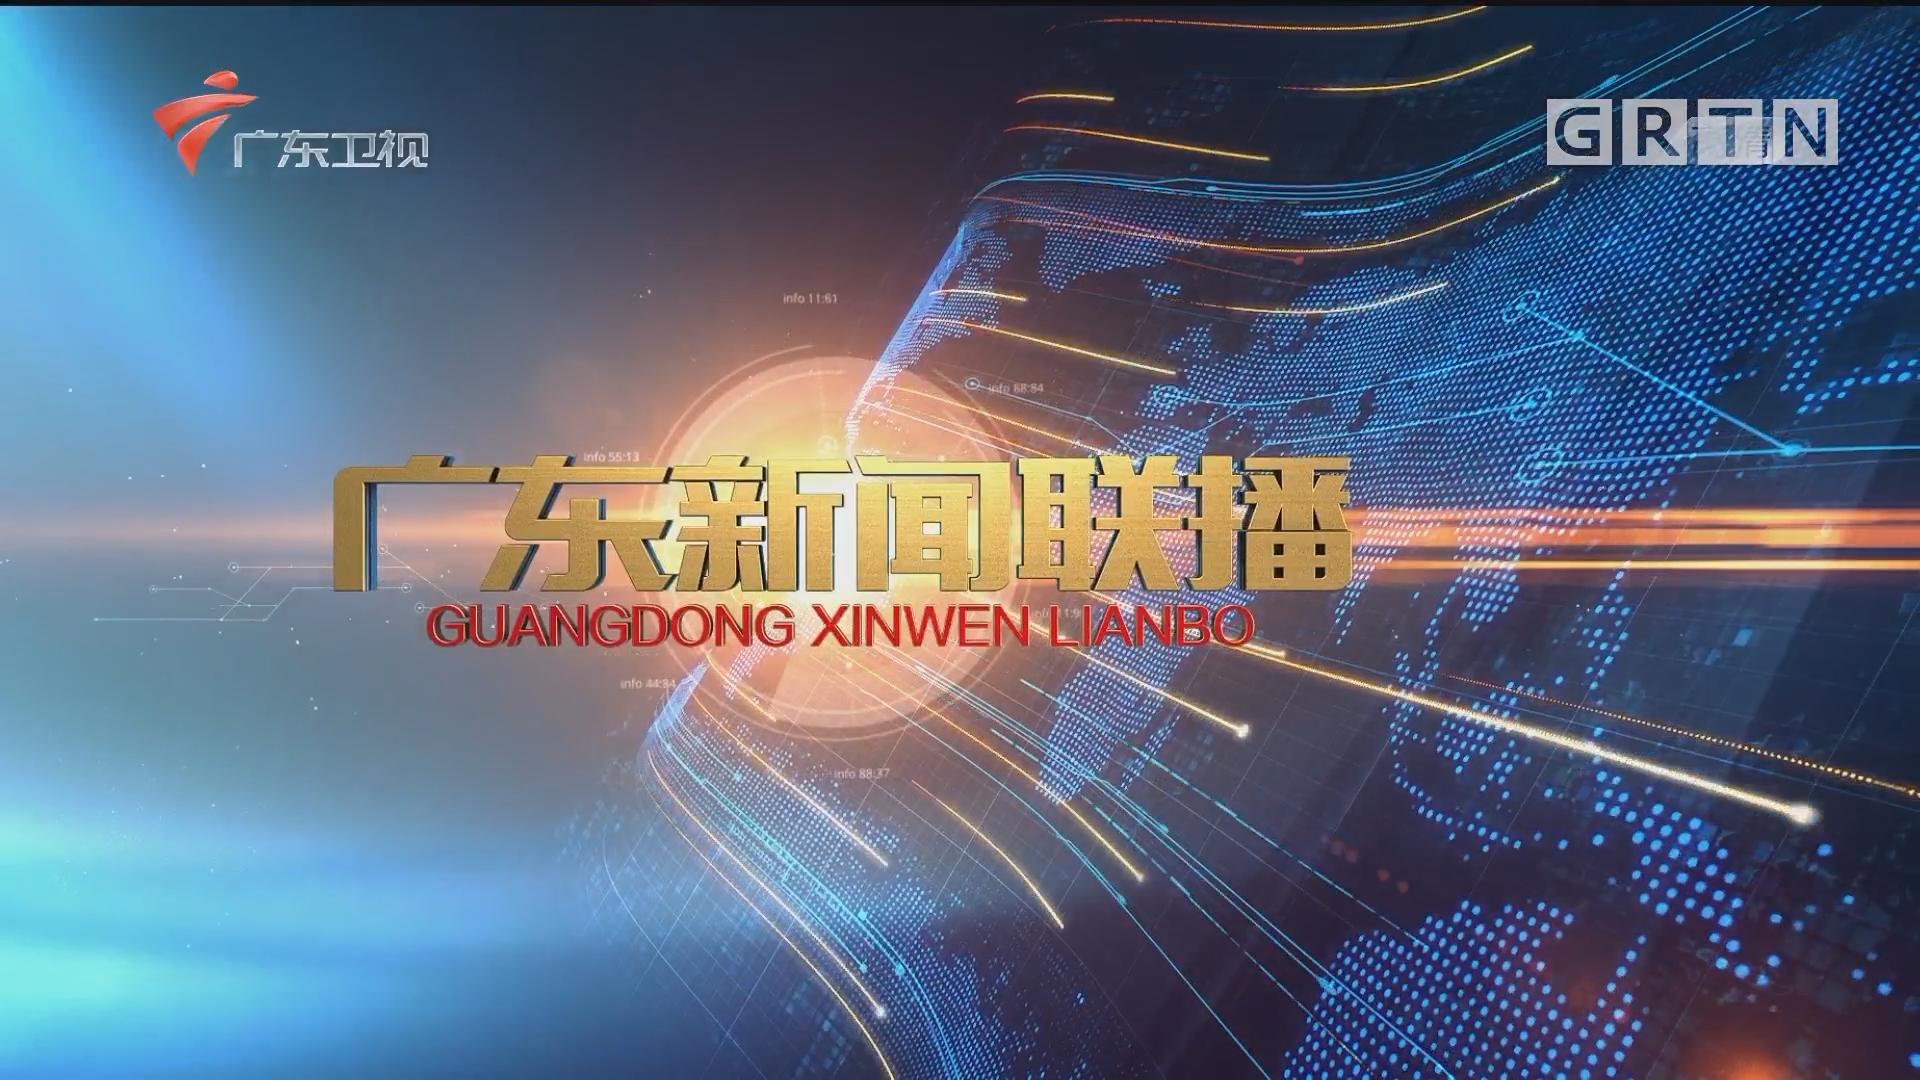 [HD][2018-08-15]广东新闻联播:广州:优化营商环境 推动创新发展